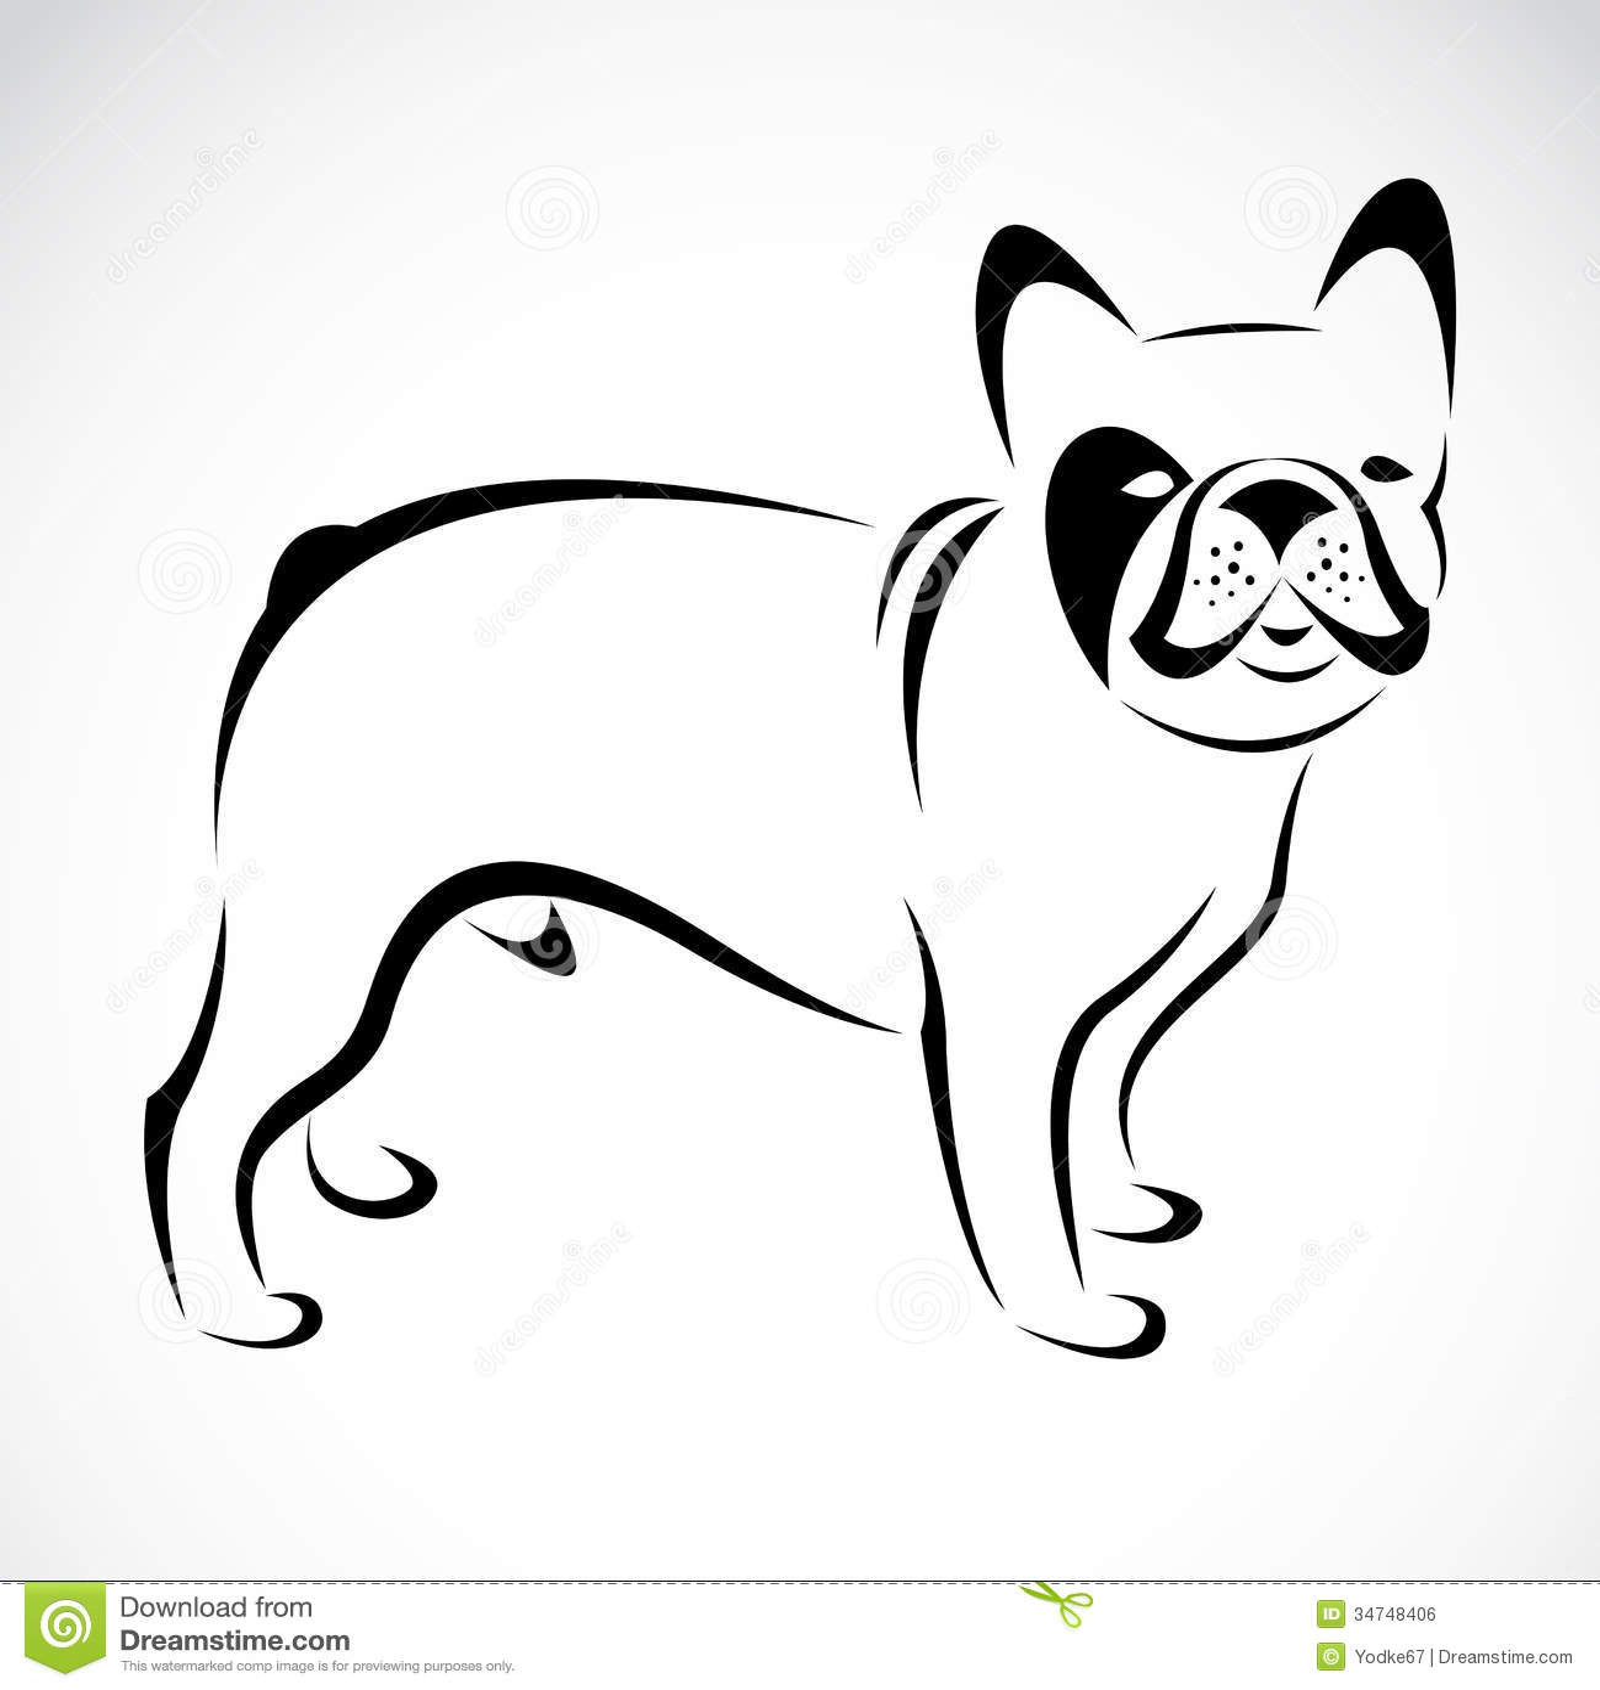 Immagine di vettore di un cane bulldog illustrazione - Colorazione immagine di un cane ...